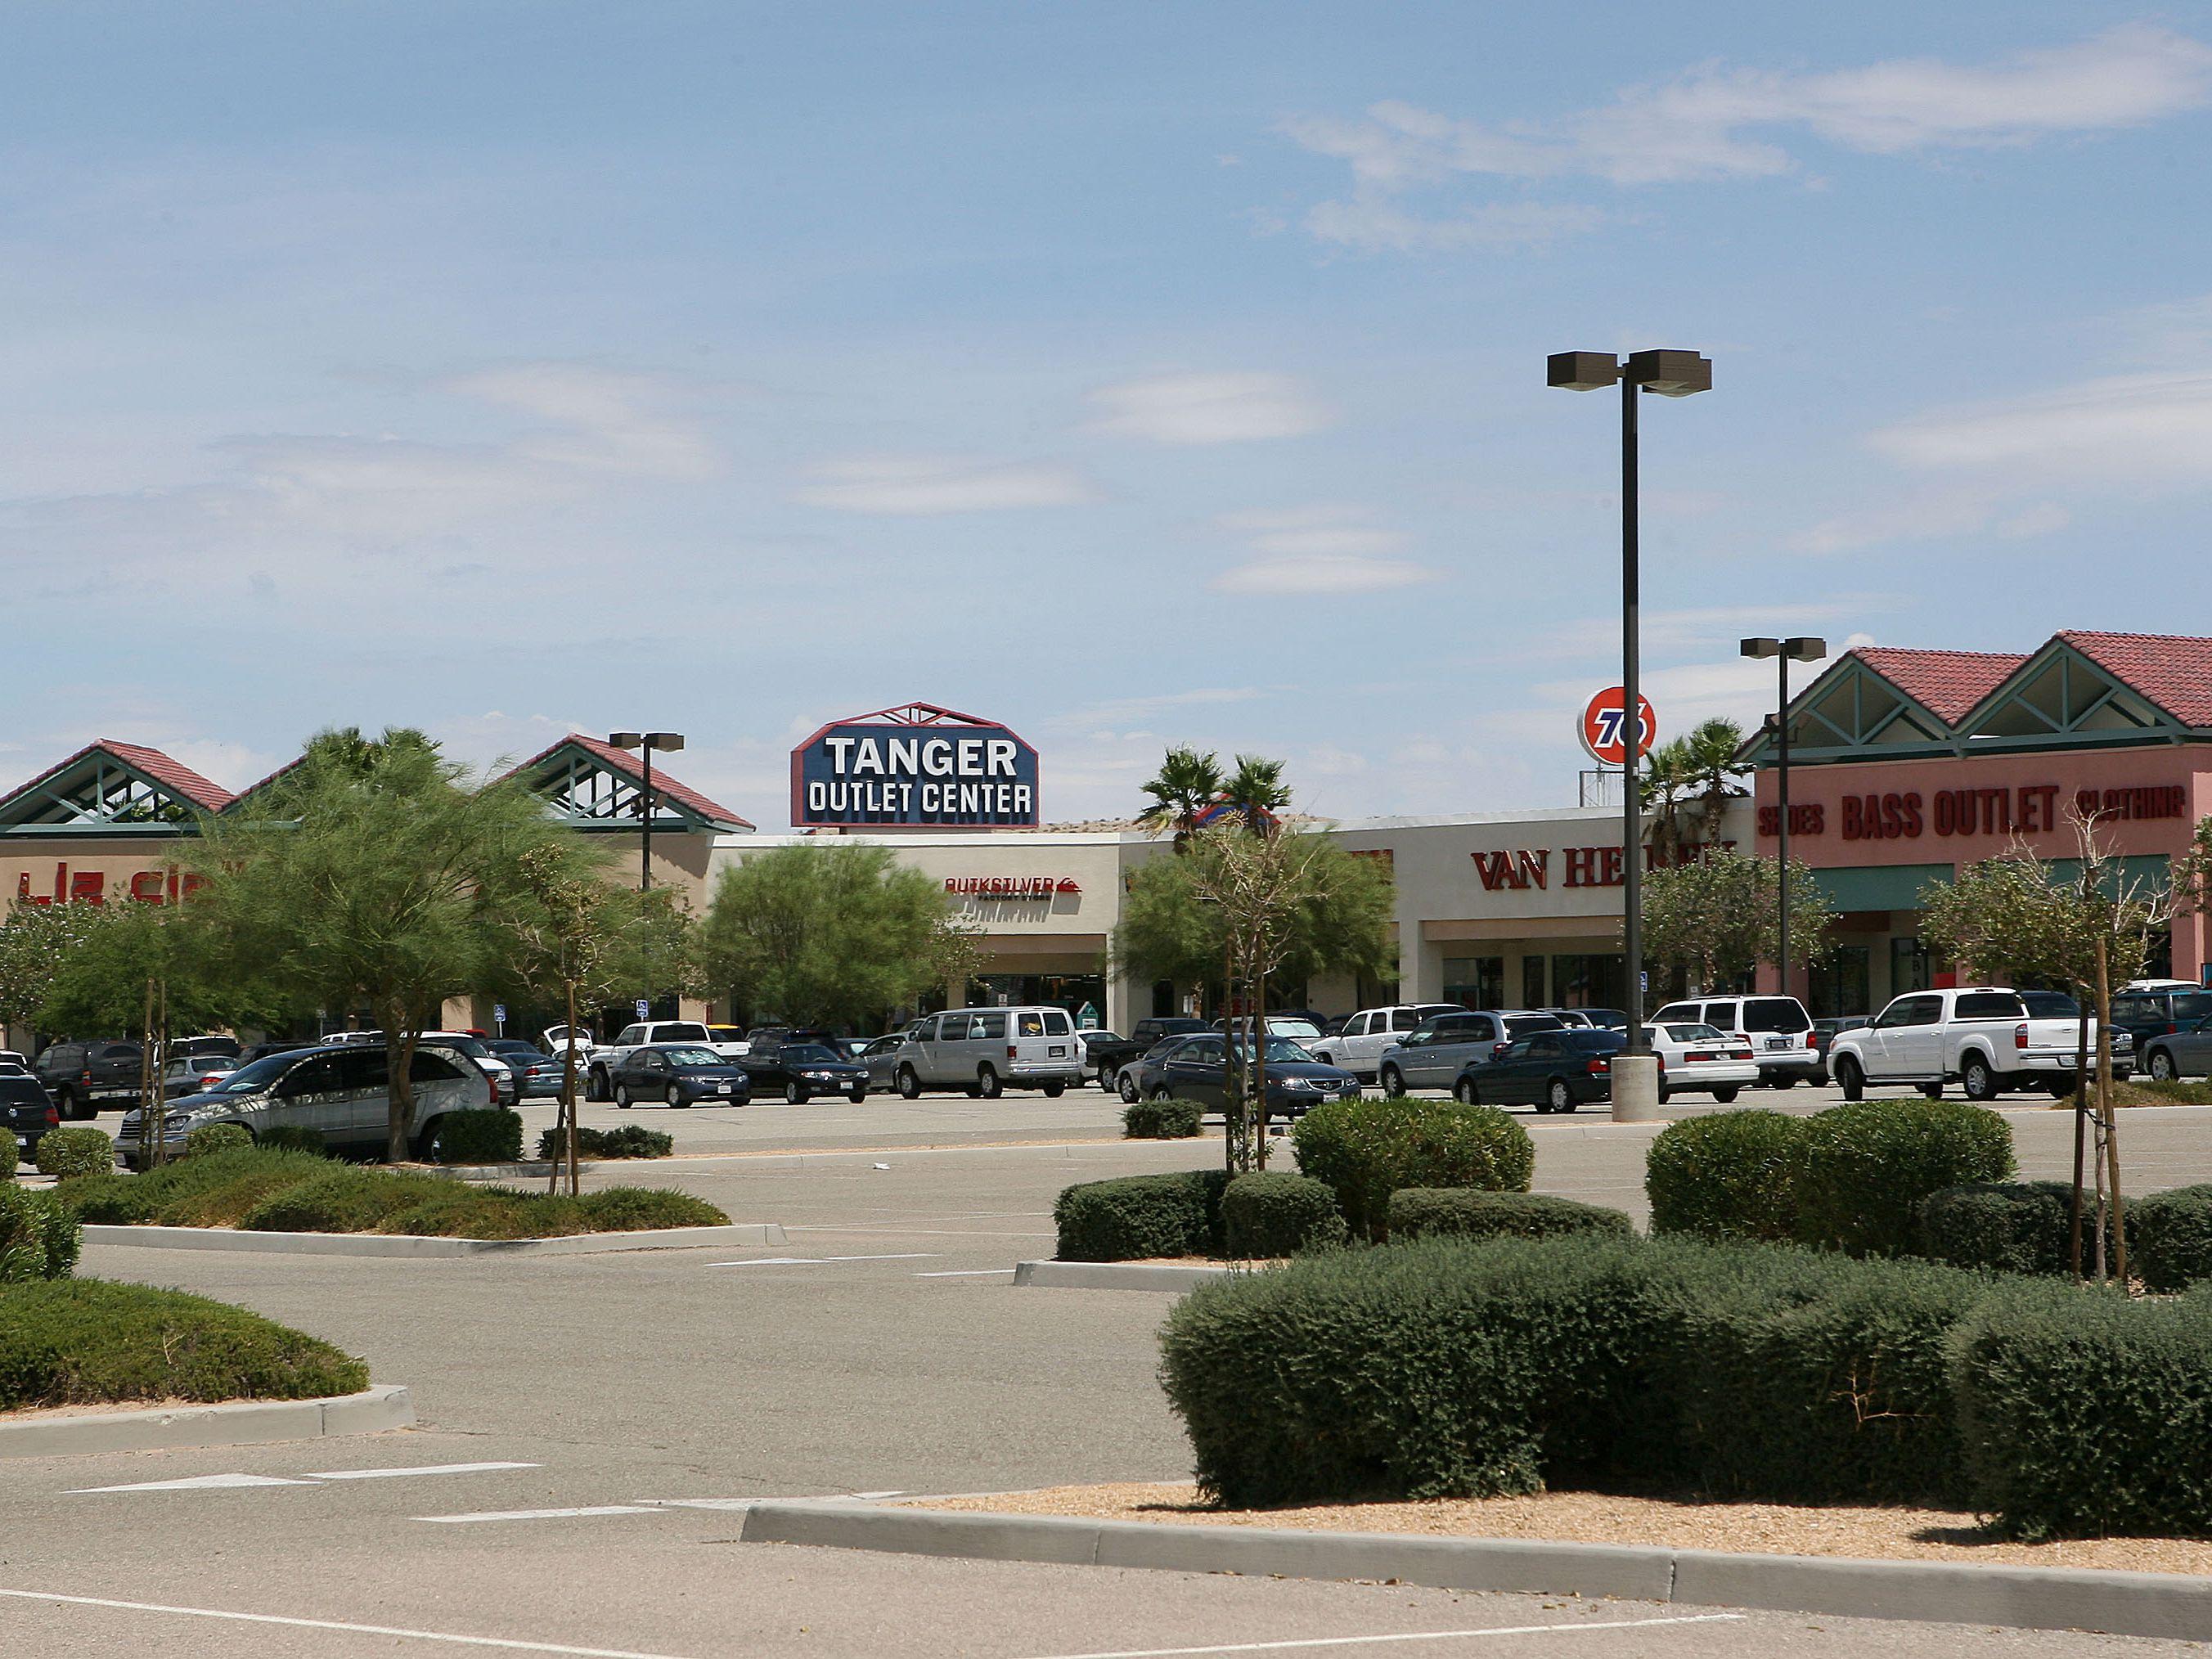 tiendas populares elige lo último elige genuino Outlet Malls in Delaware - Tanger Outlets Rehoboth Beach